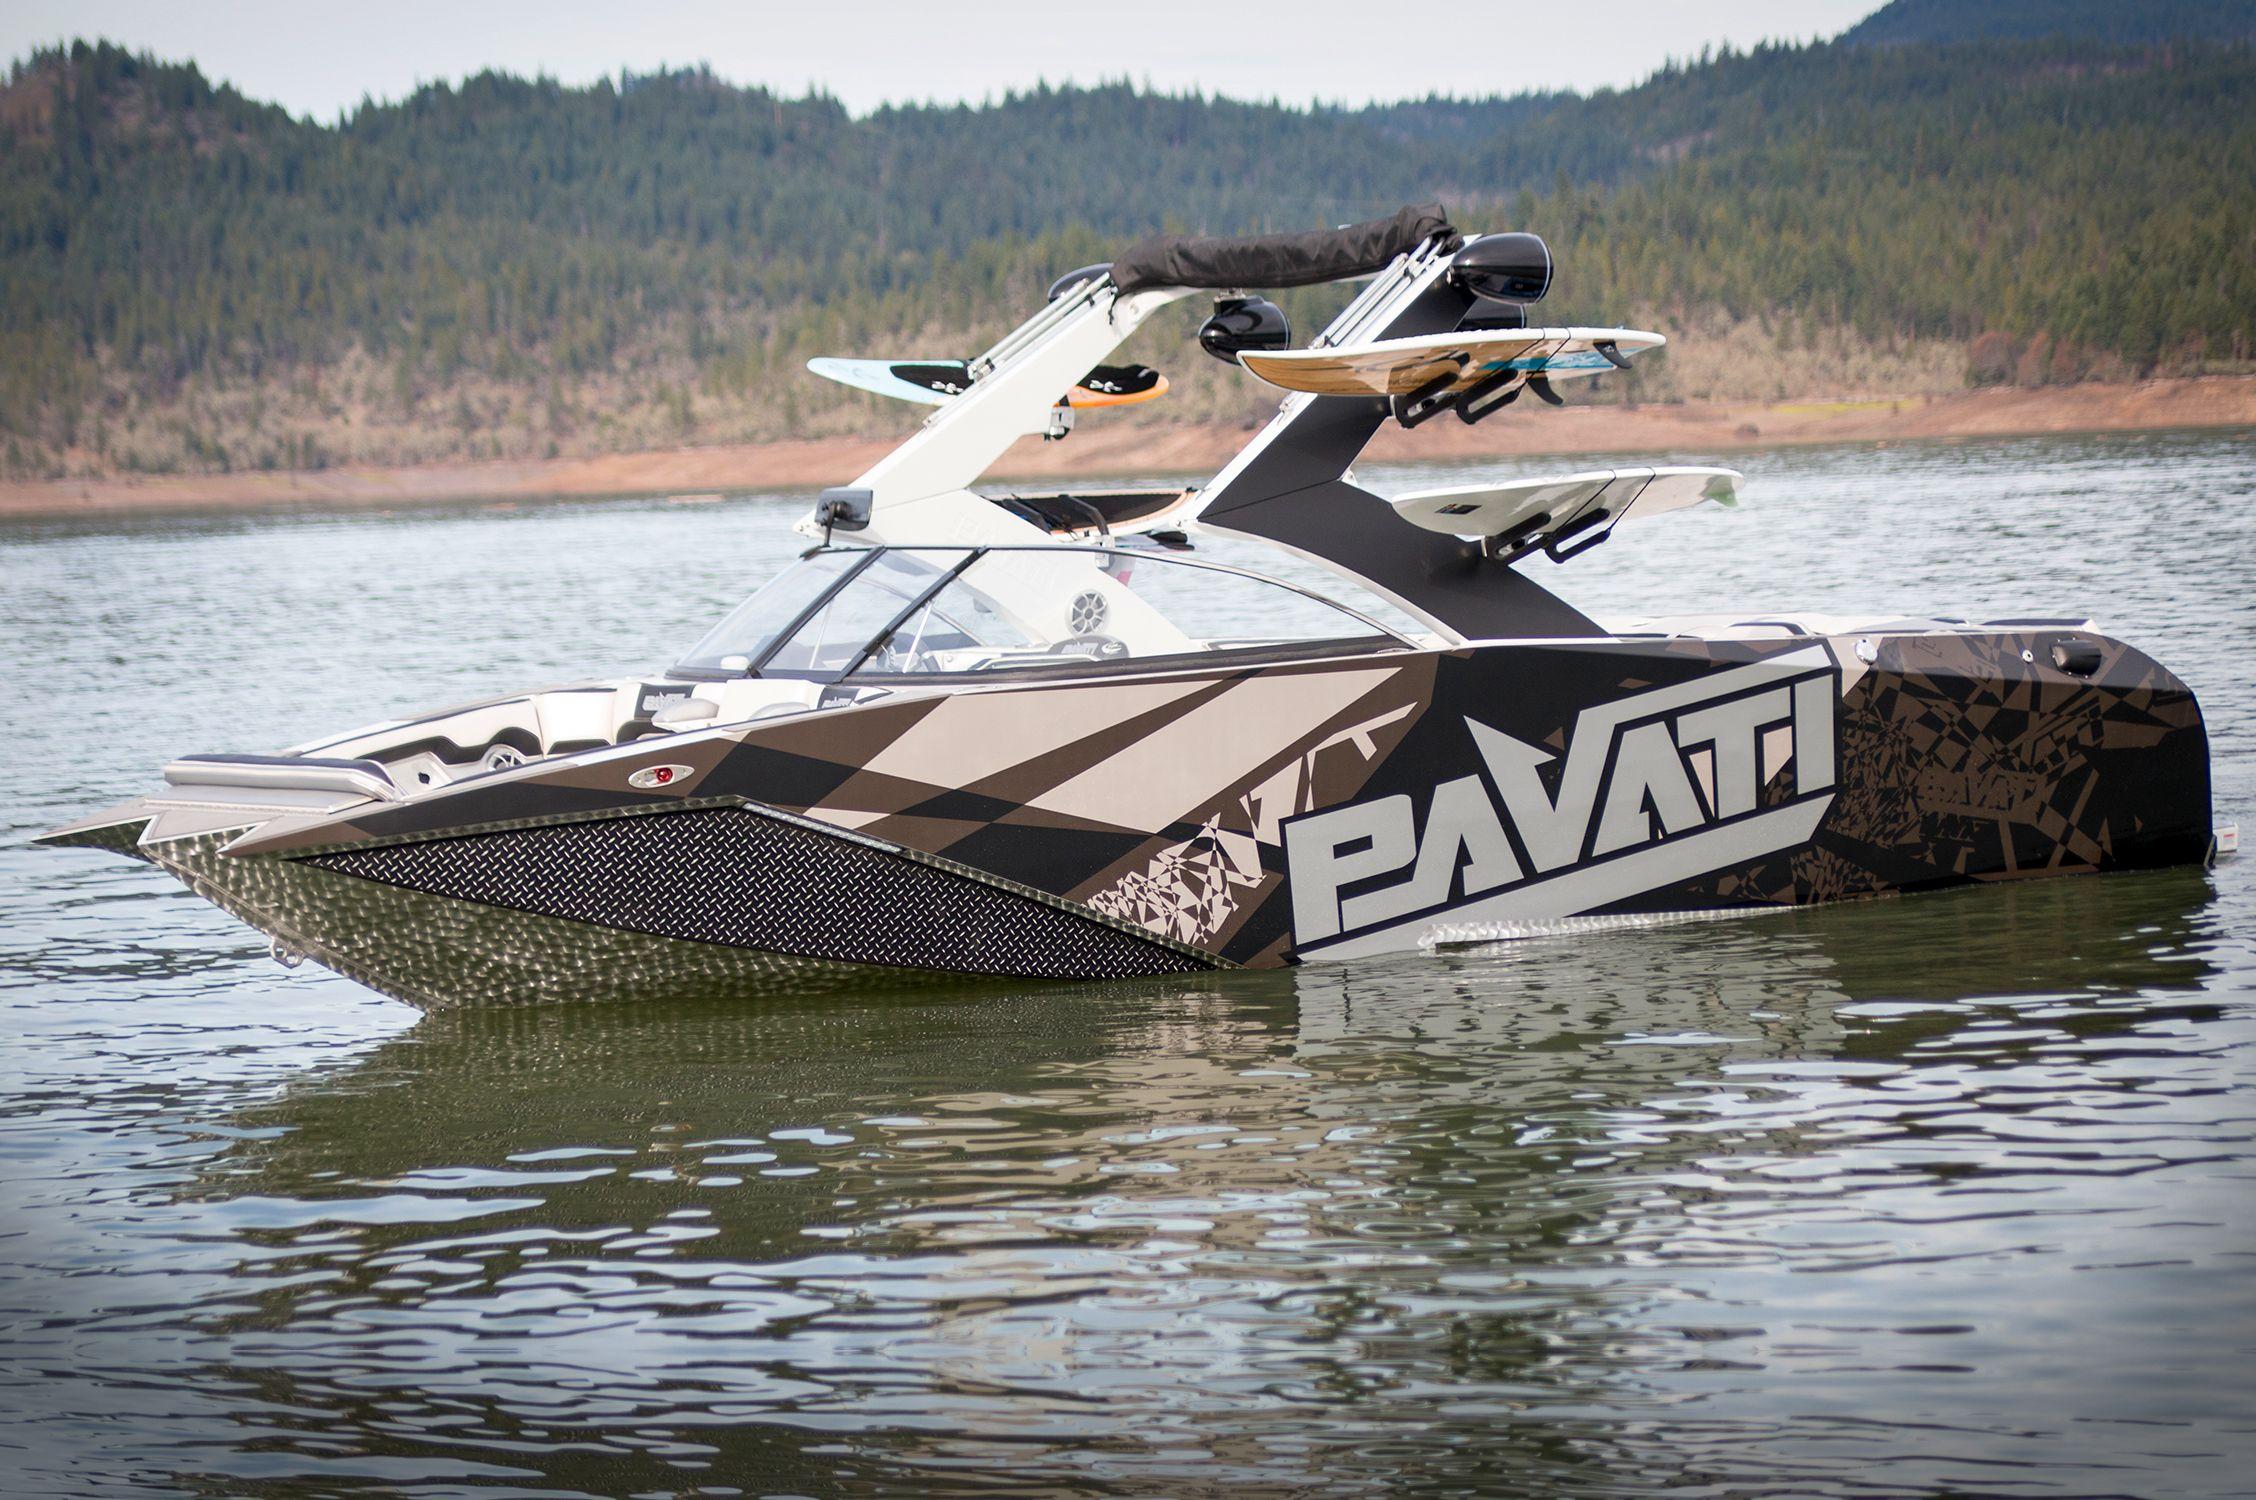 2015 Pavati AL24s Wake Boat w/ Silver Lightning wrap